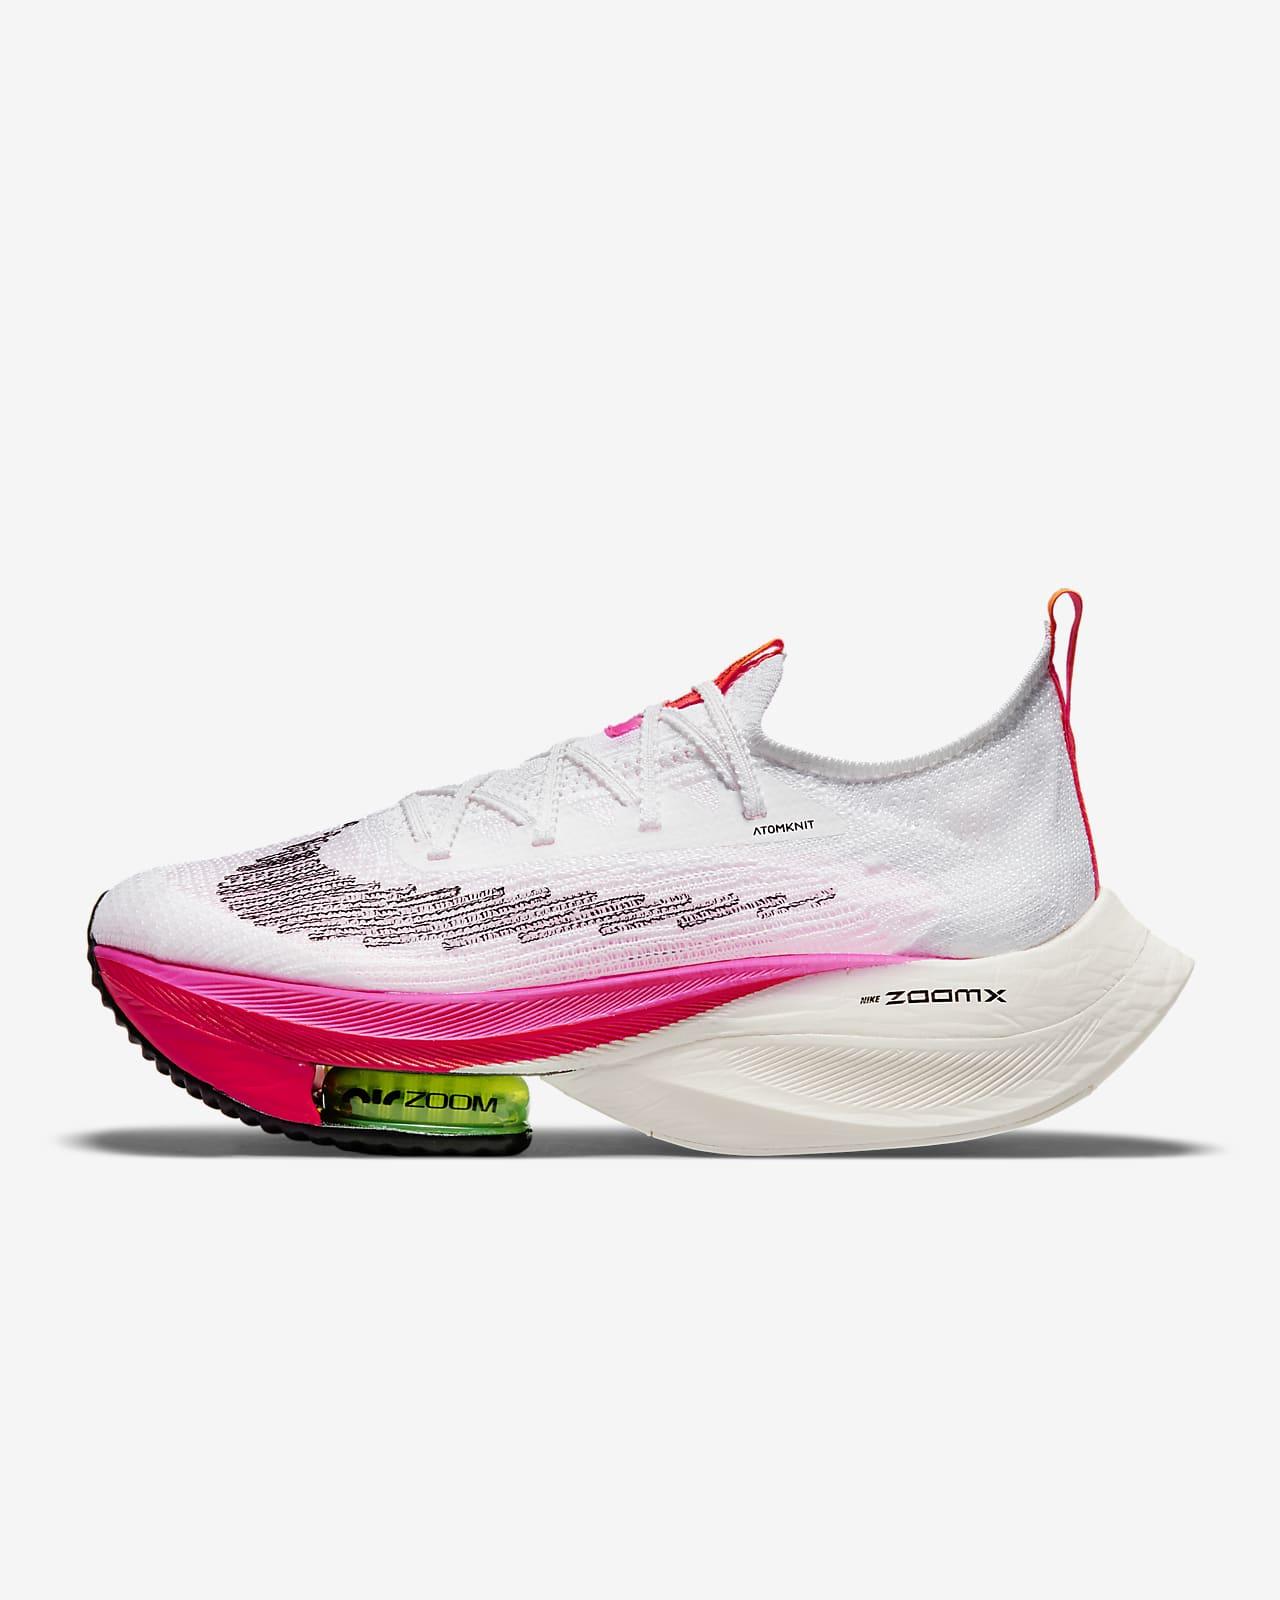 Calzado de carrera de carretera para mujer Nike Air Zoom Alphafly NEXT% Flyknit